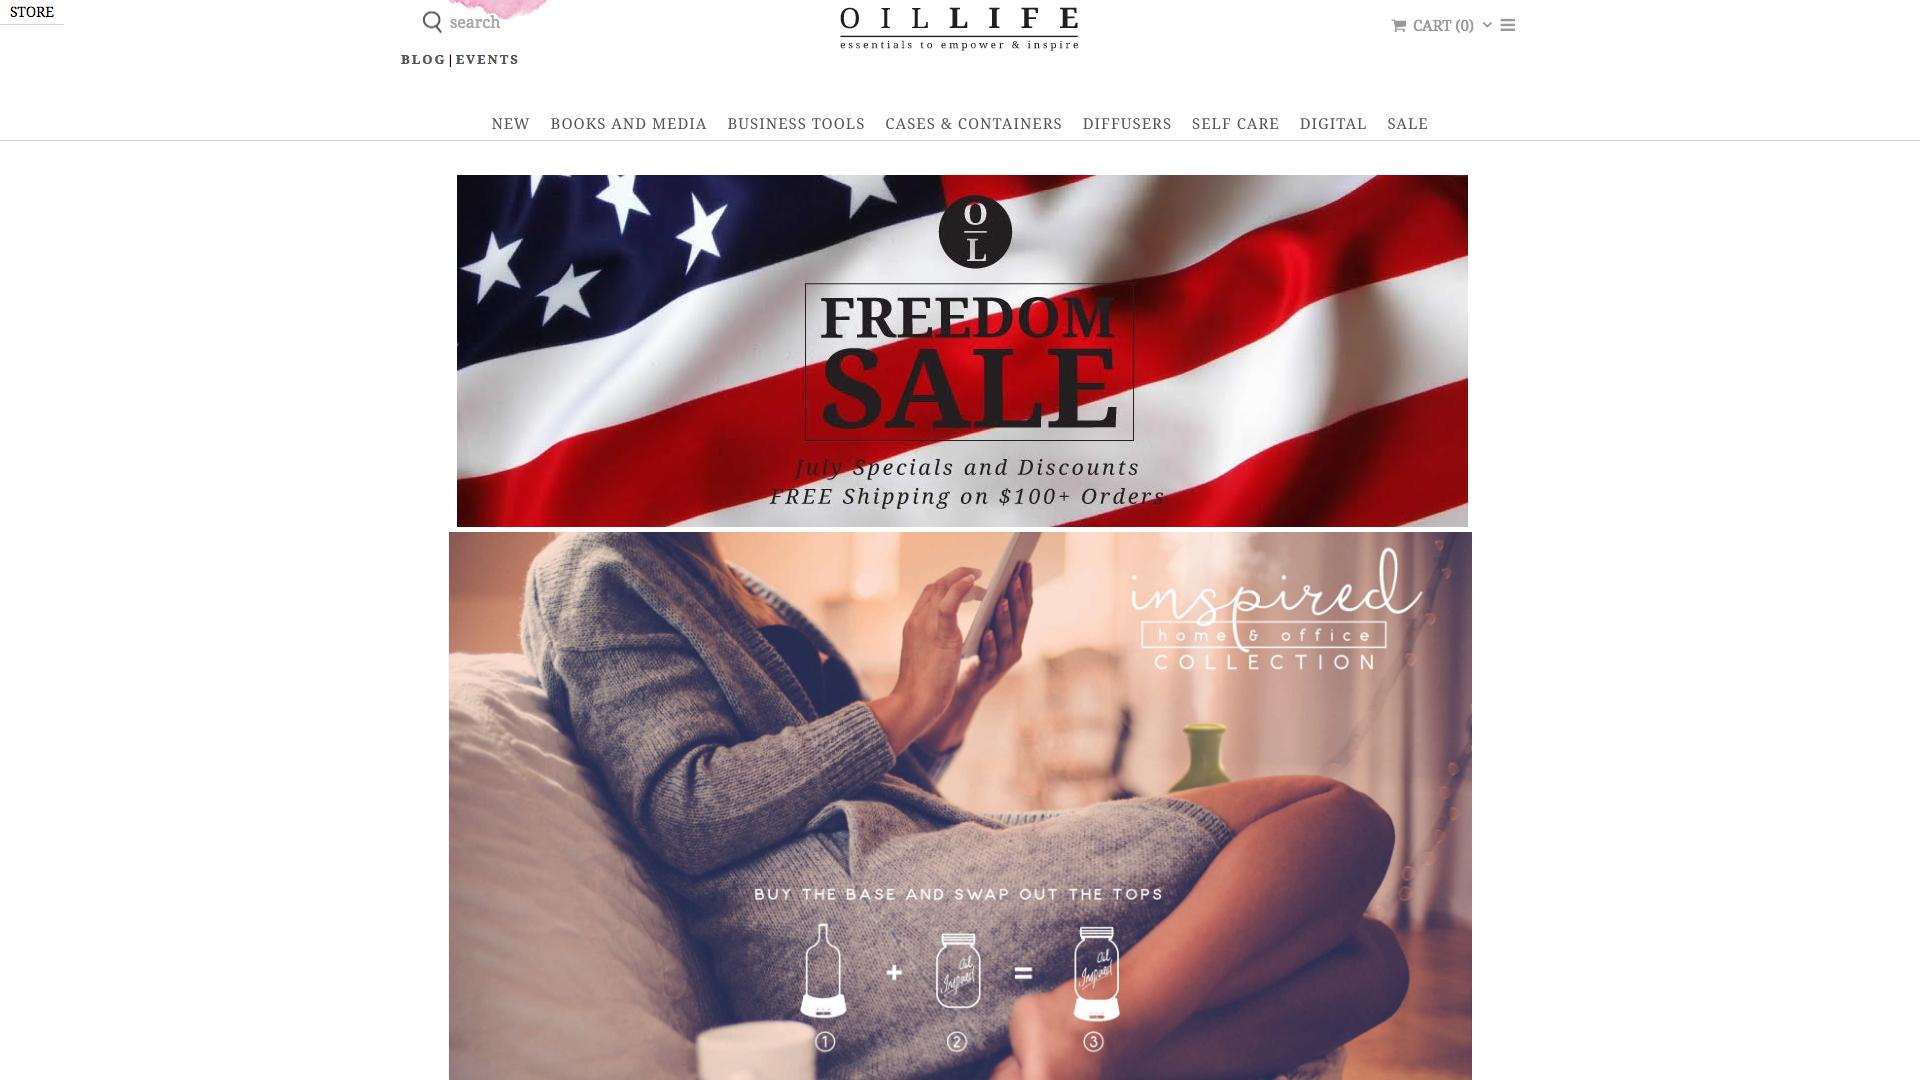 Oil Life Website